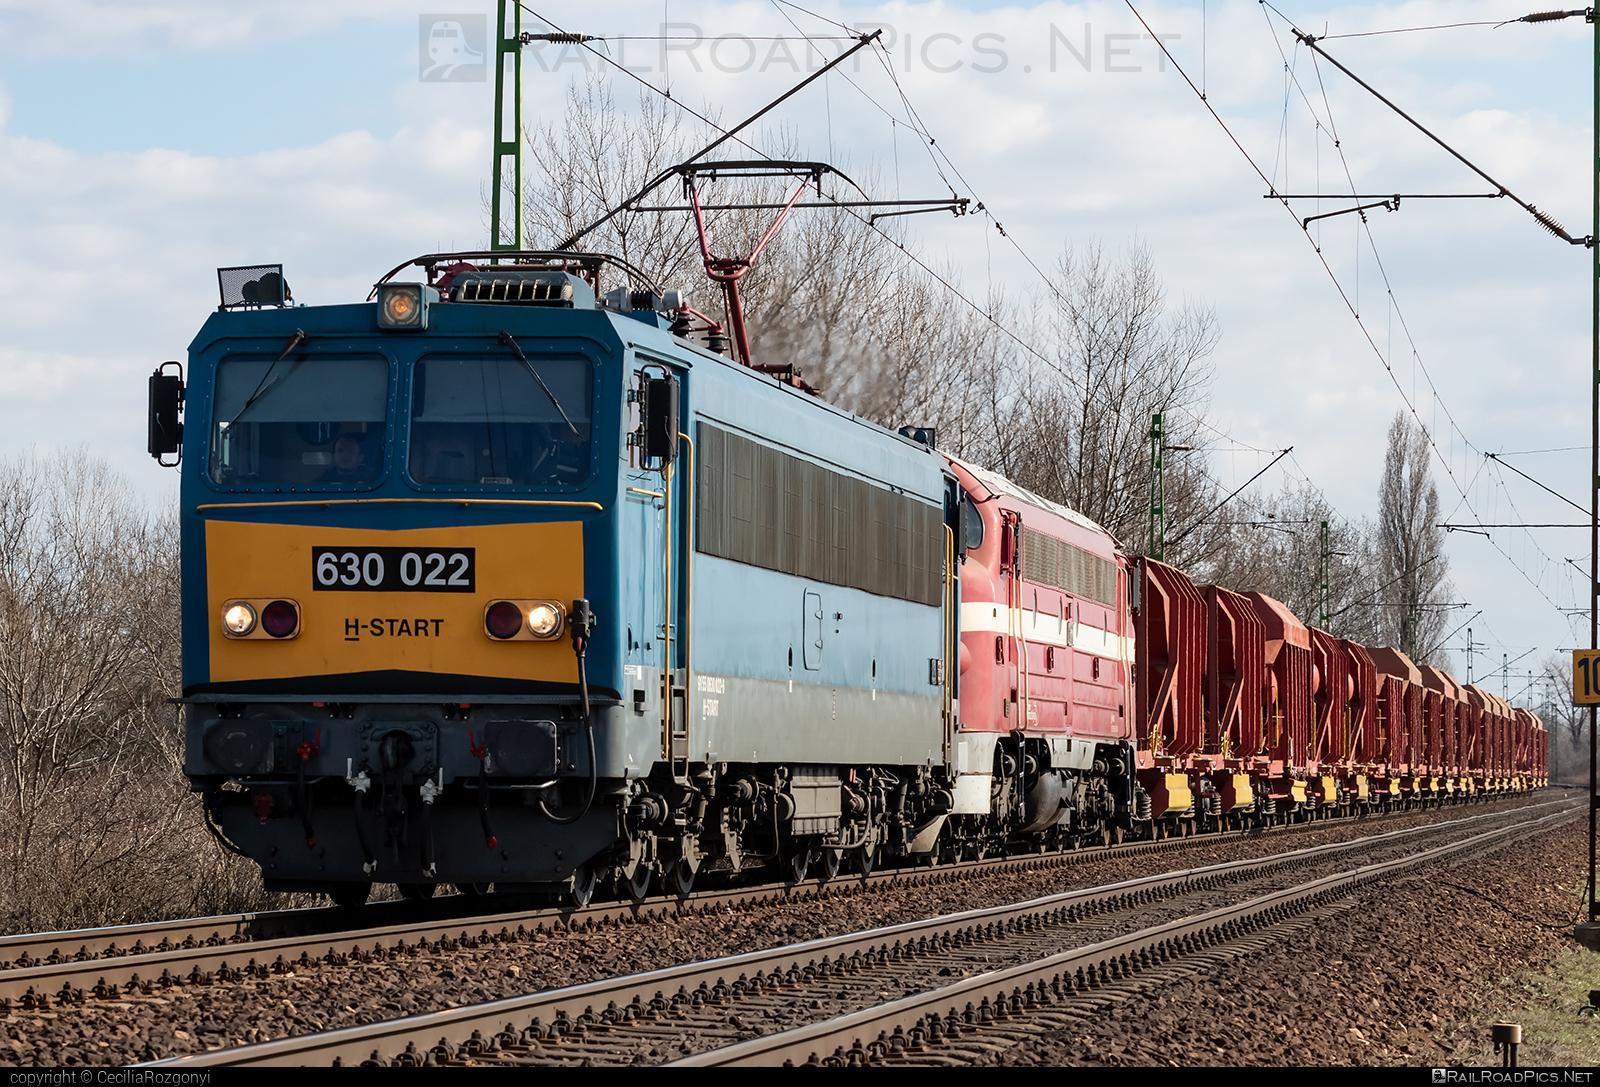 Ganz-MÁVAG VM15-3 - 630 022 operated by MÁV-START ZRt. #ganz63 #ganz630 #ganzmavag #ganzmavag63 #ganzmavag630 #ganzmavagvm153 #locomotive630 #mav #mavstart #mavstartzrt #v63locomotive